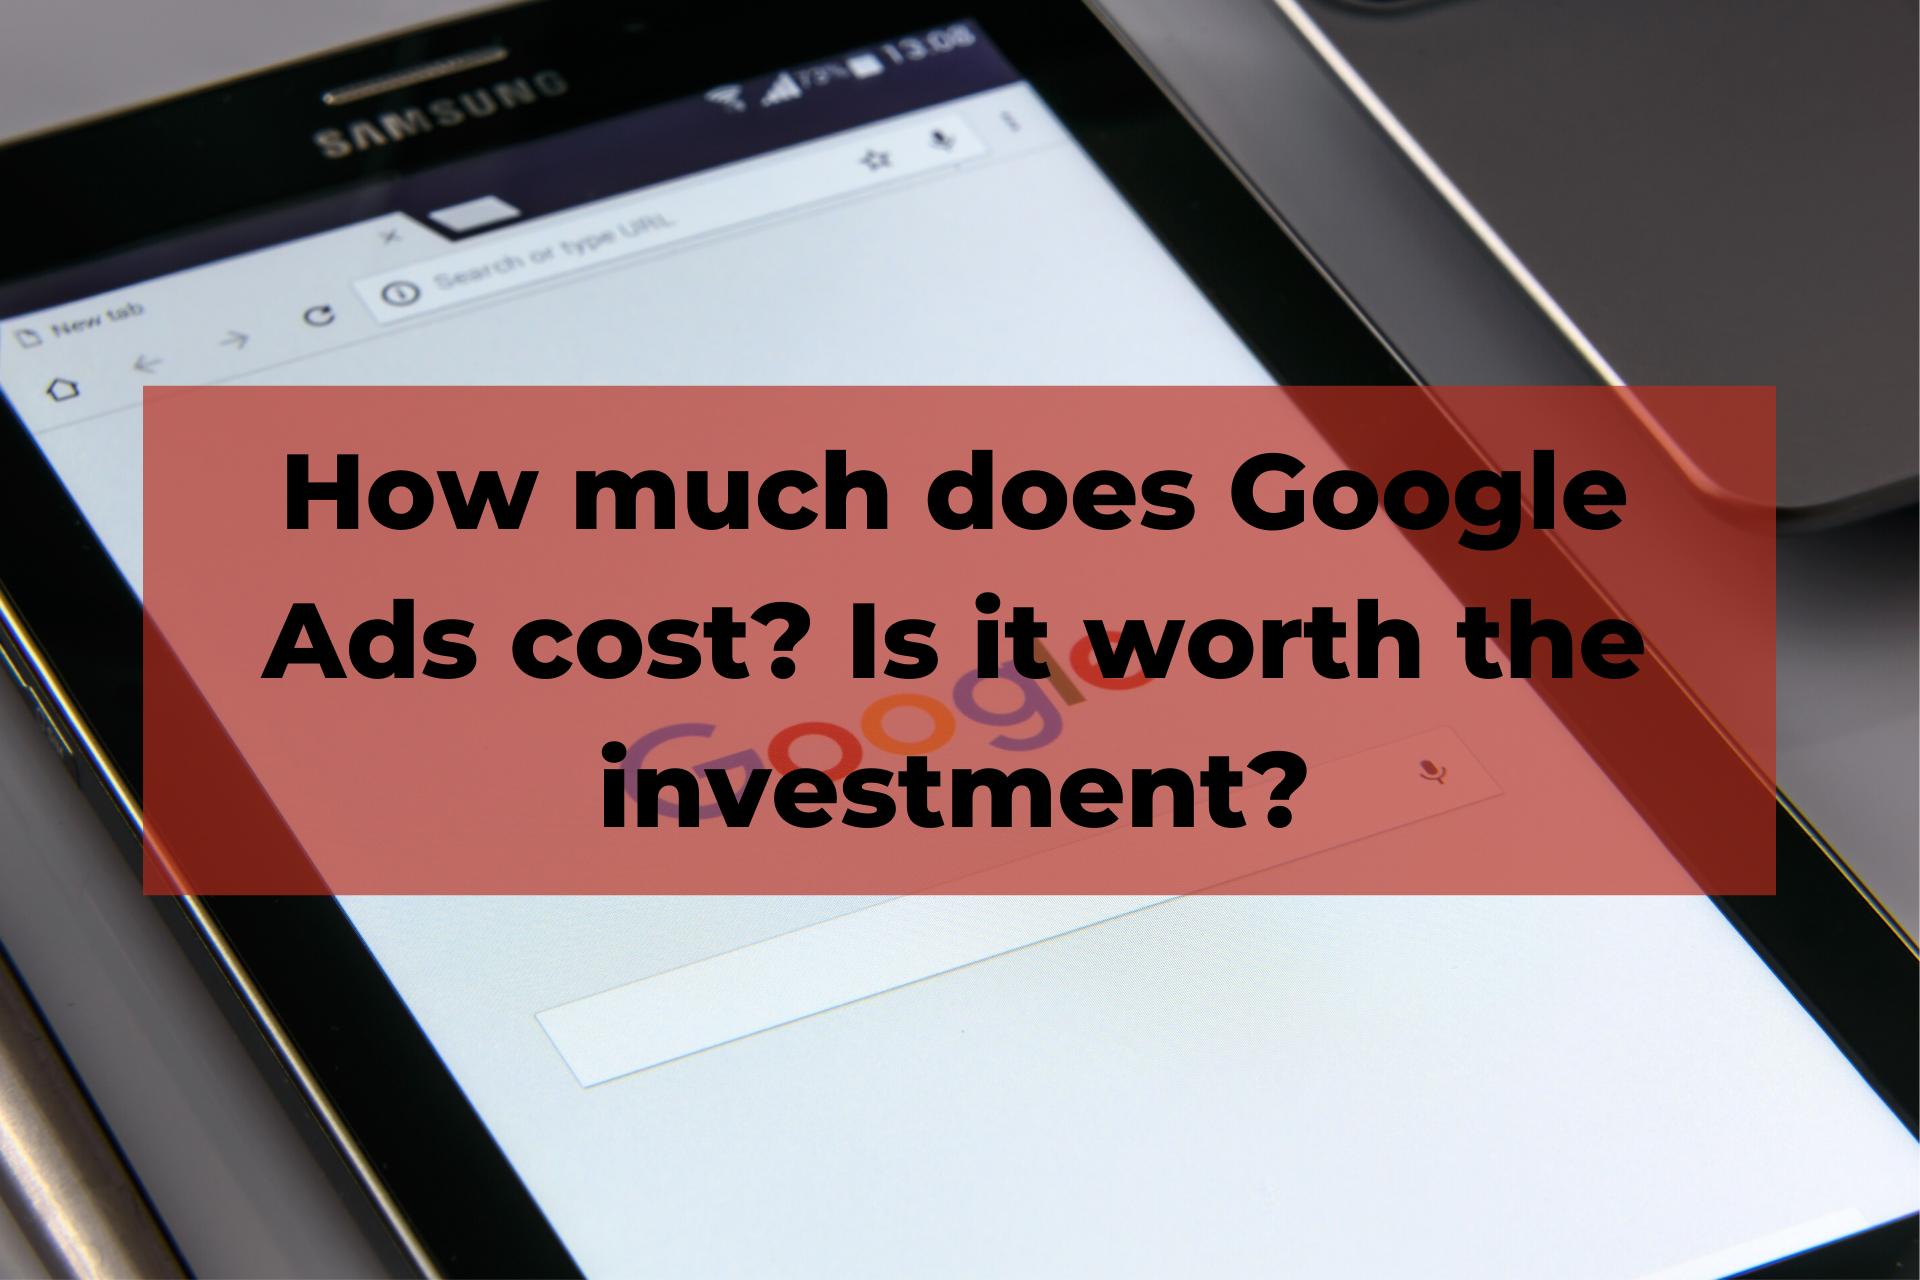 Google Ads cost